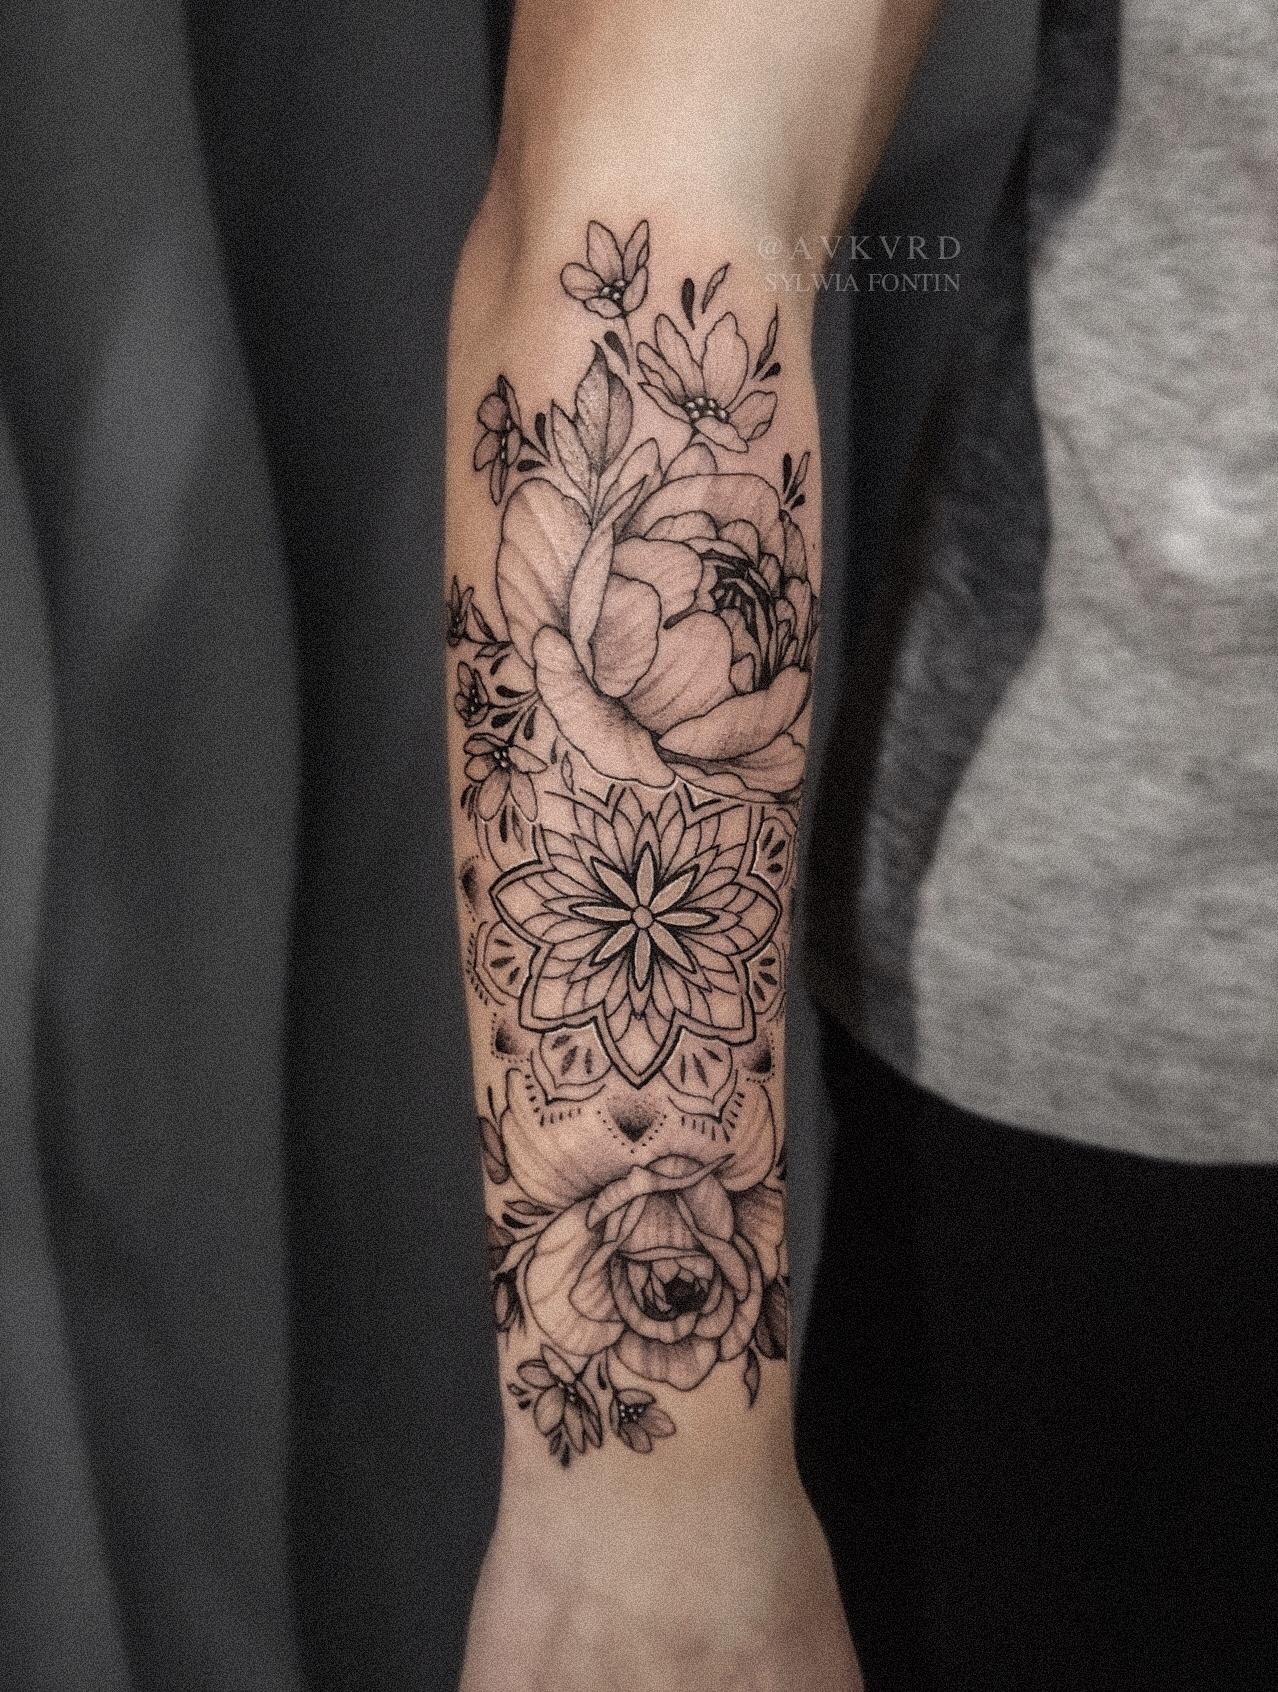 Inksearch tattoo Sylwia Fontin